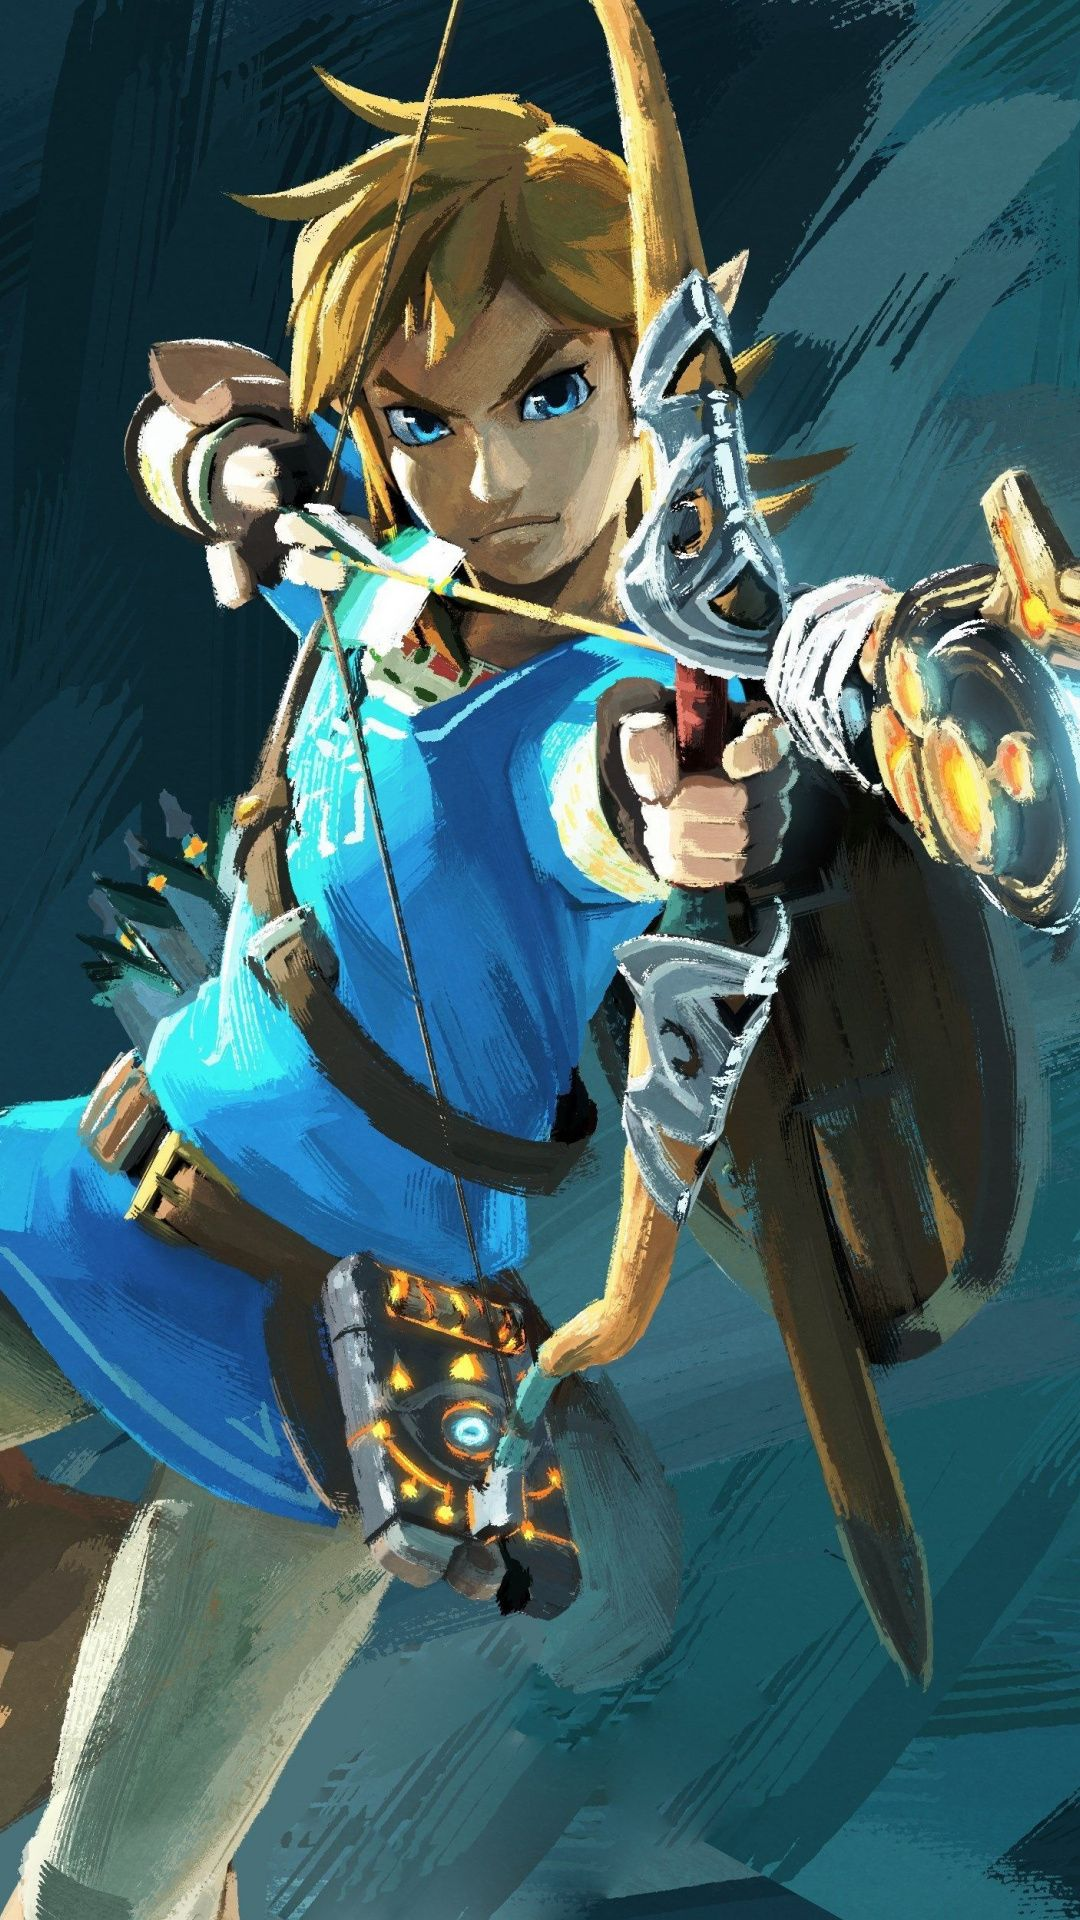 The Legend of Zelda, Link the warrior, video game